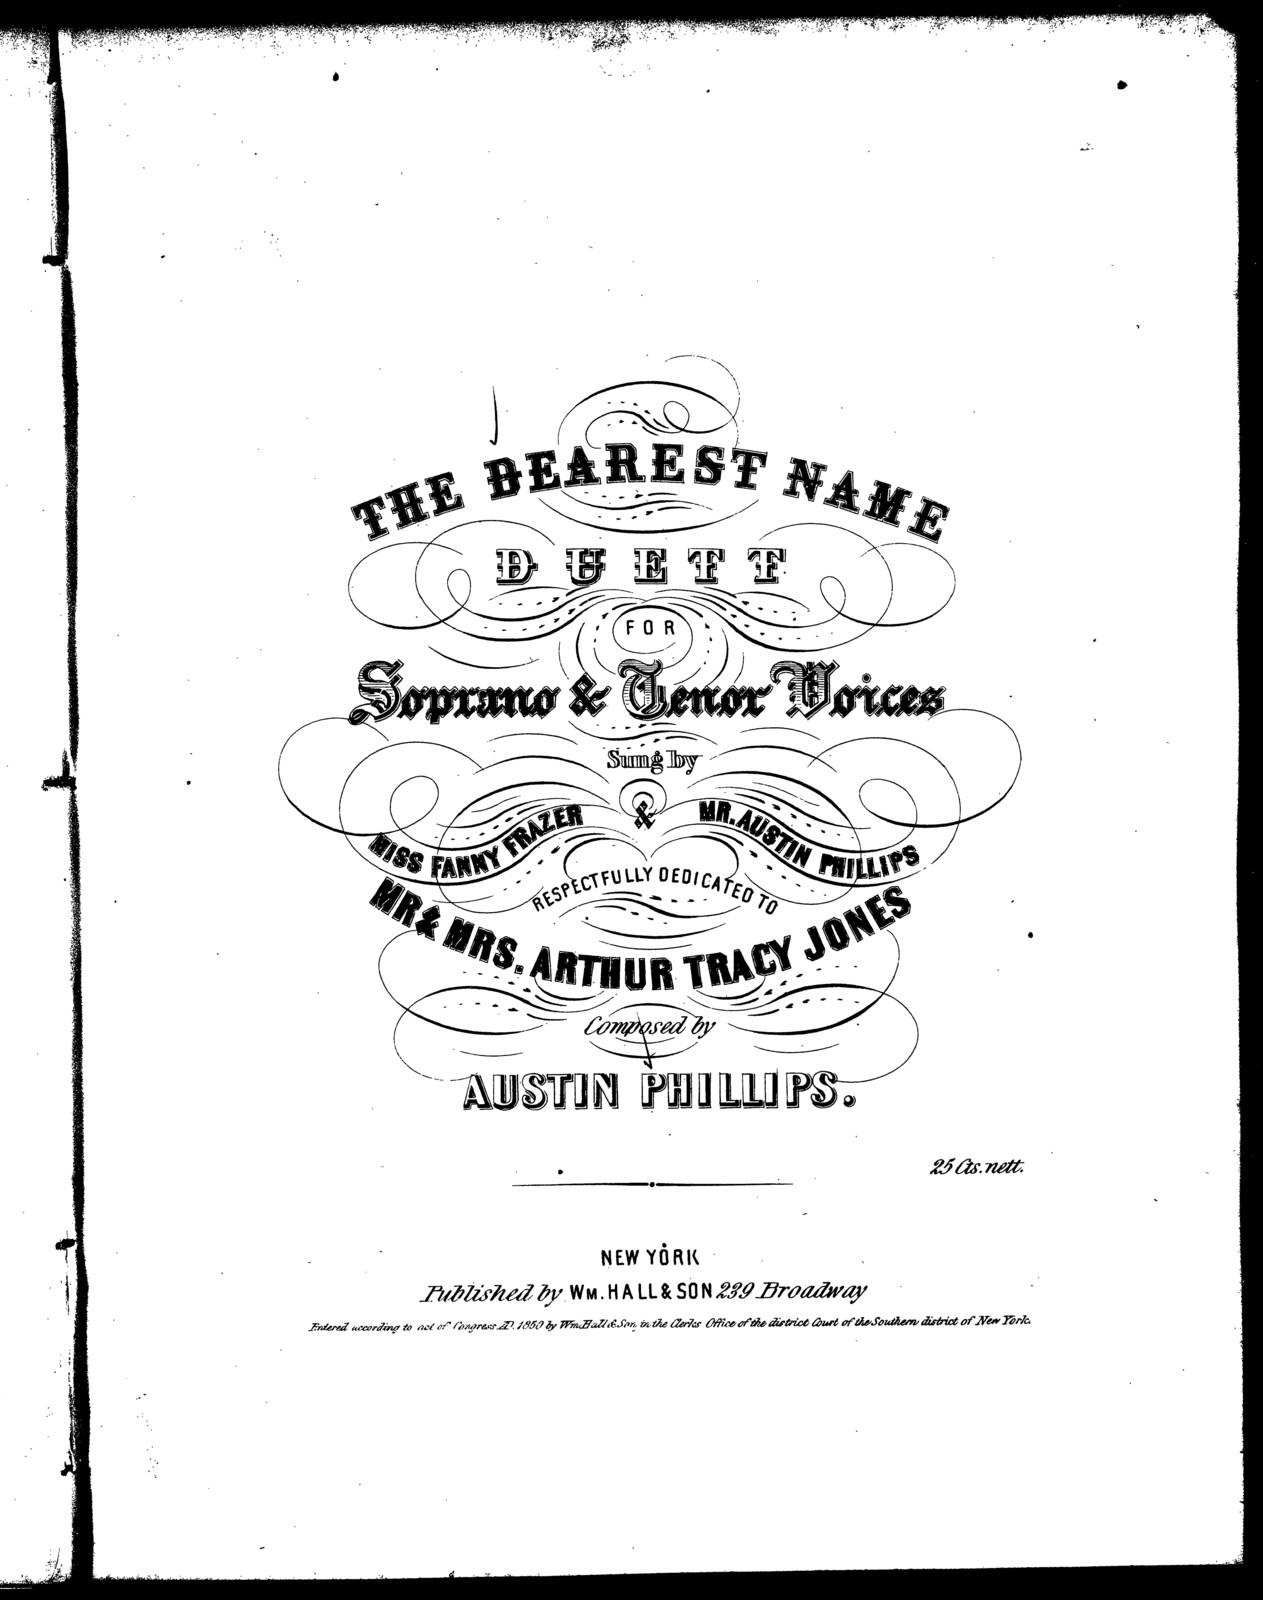 The  dearest name